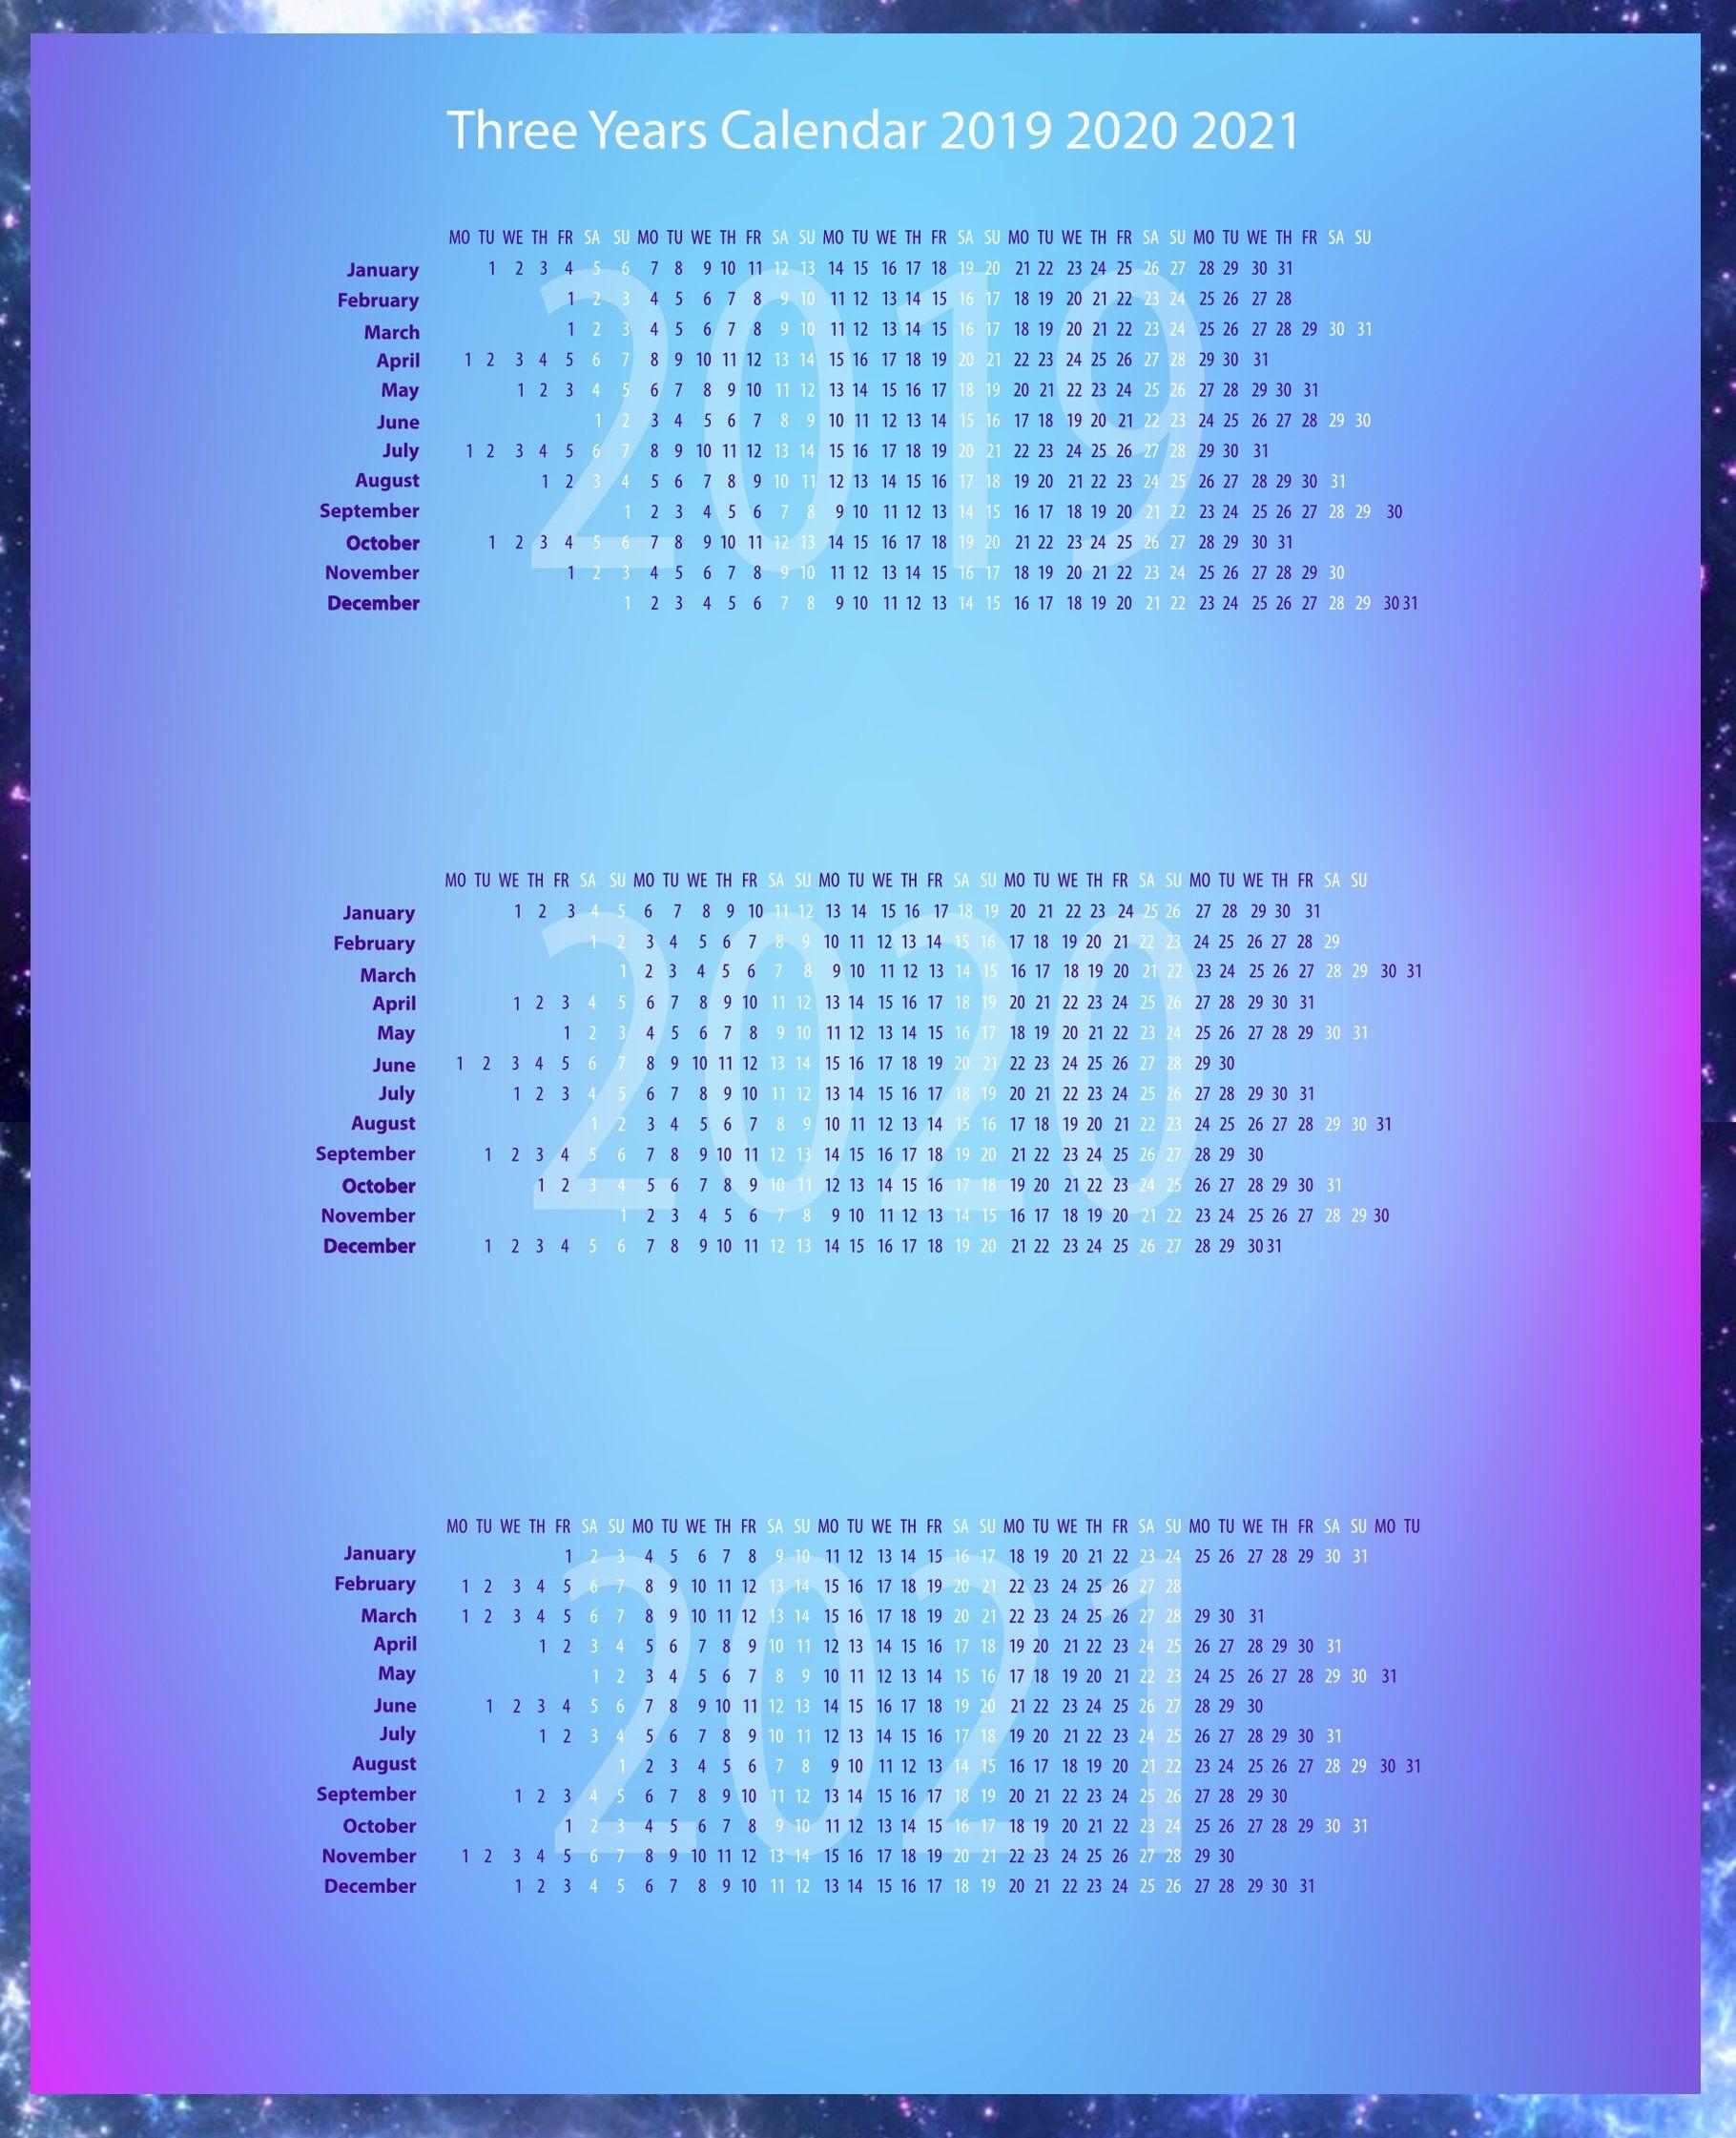 Zodiac Calendar 2019 2020 2021 Zodiac Calendar Calendar 2019 And 2020 Calendar